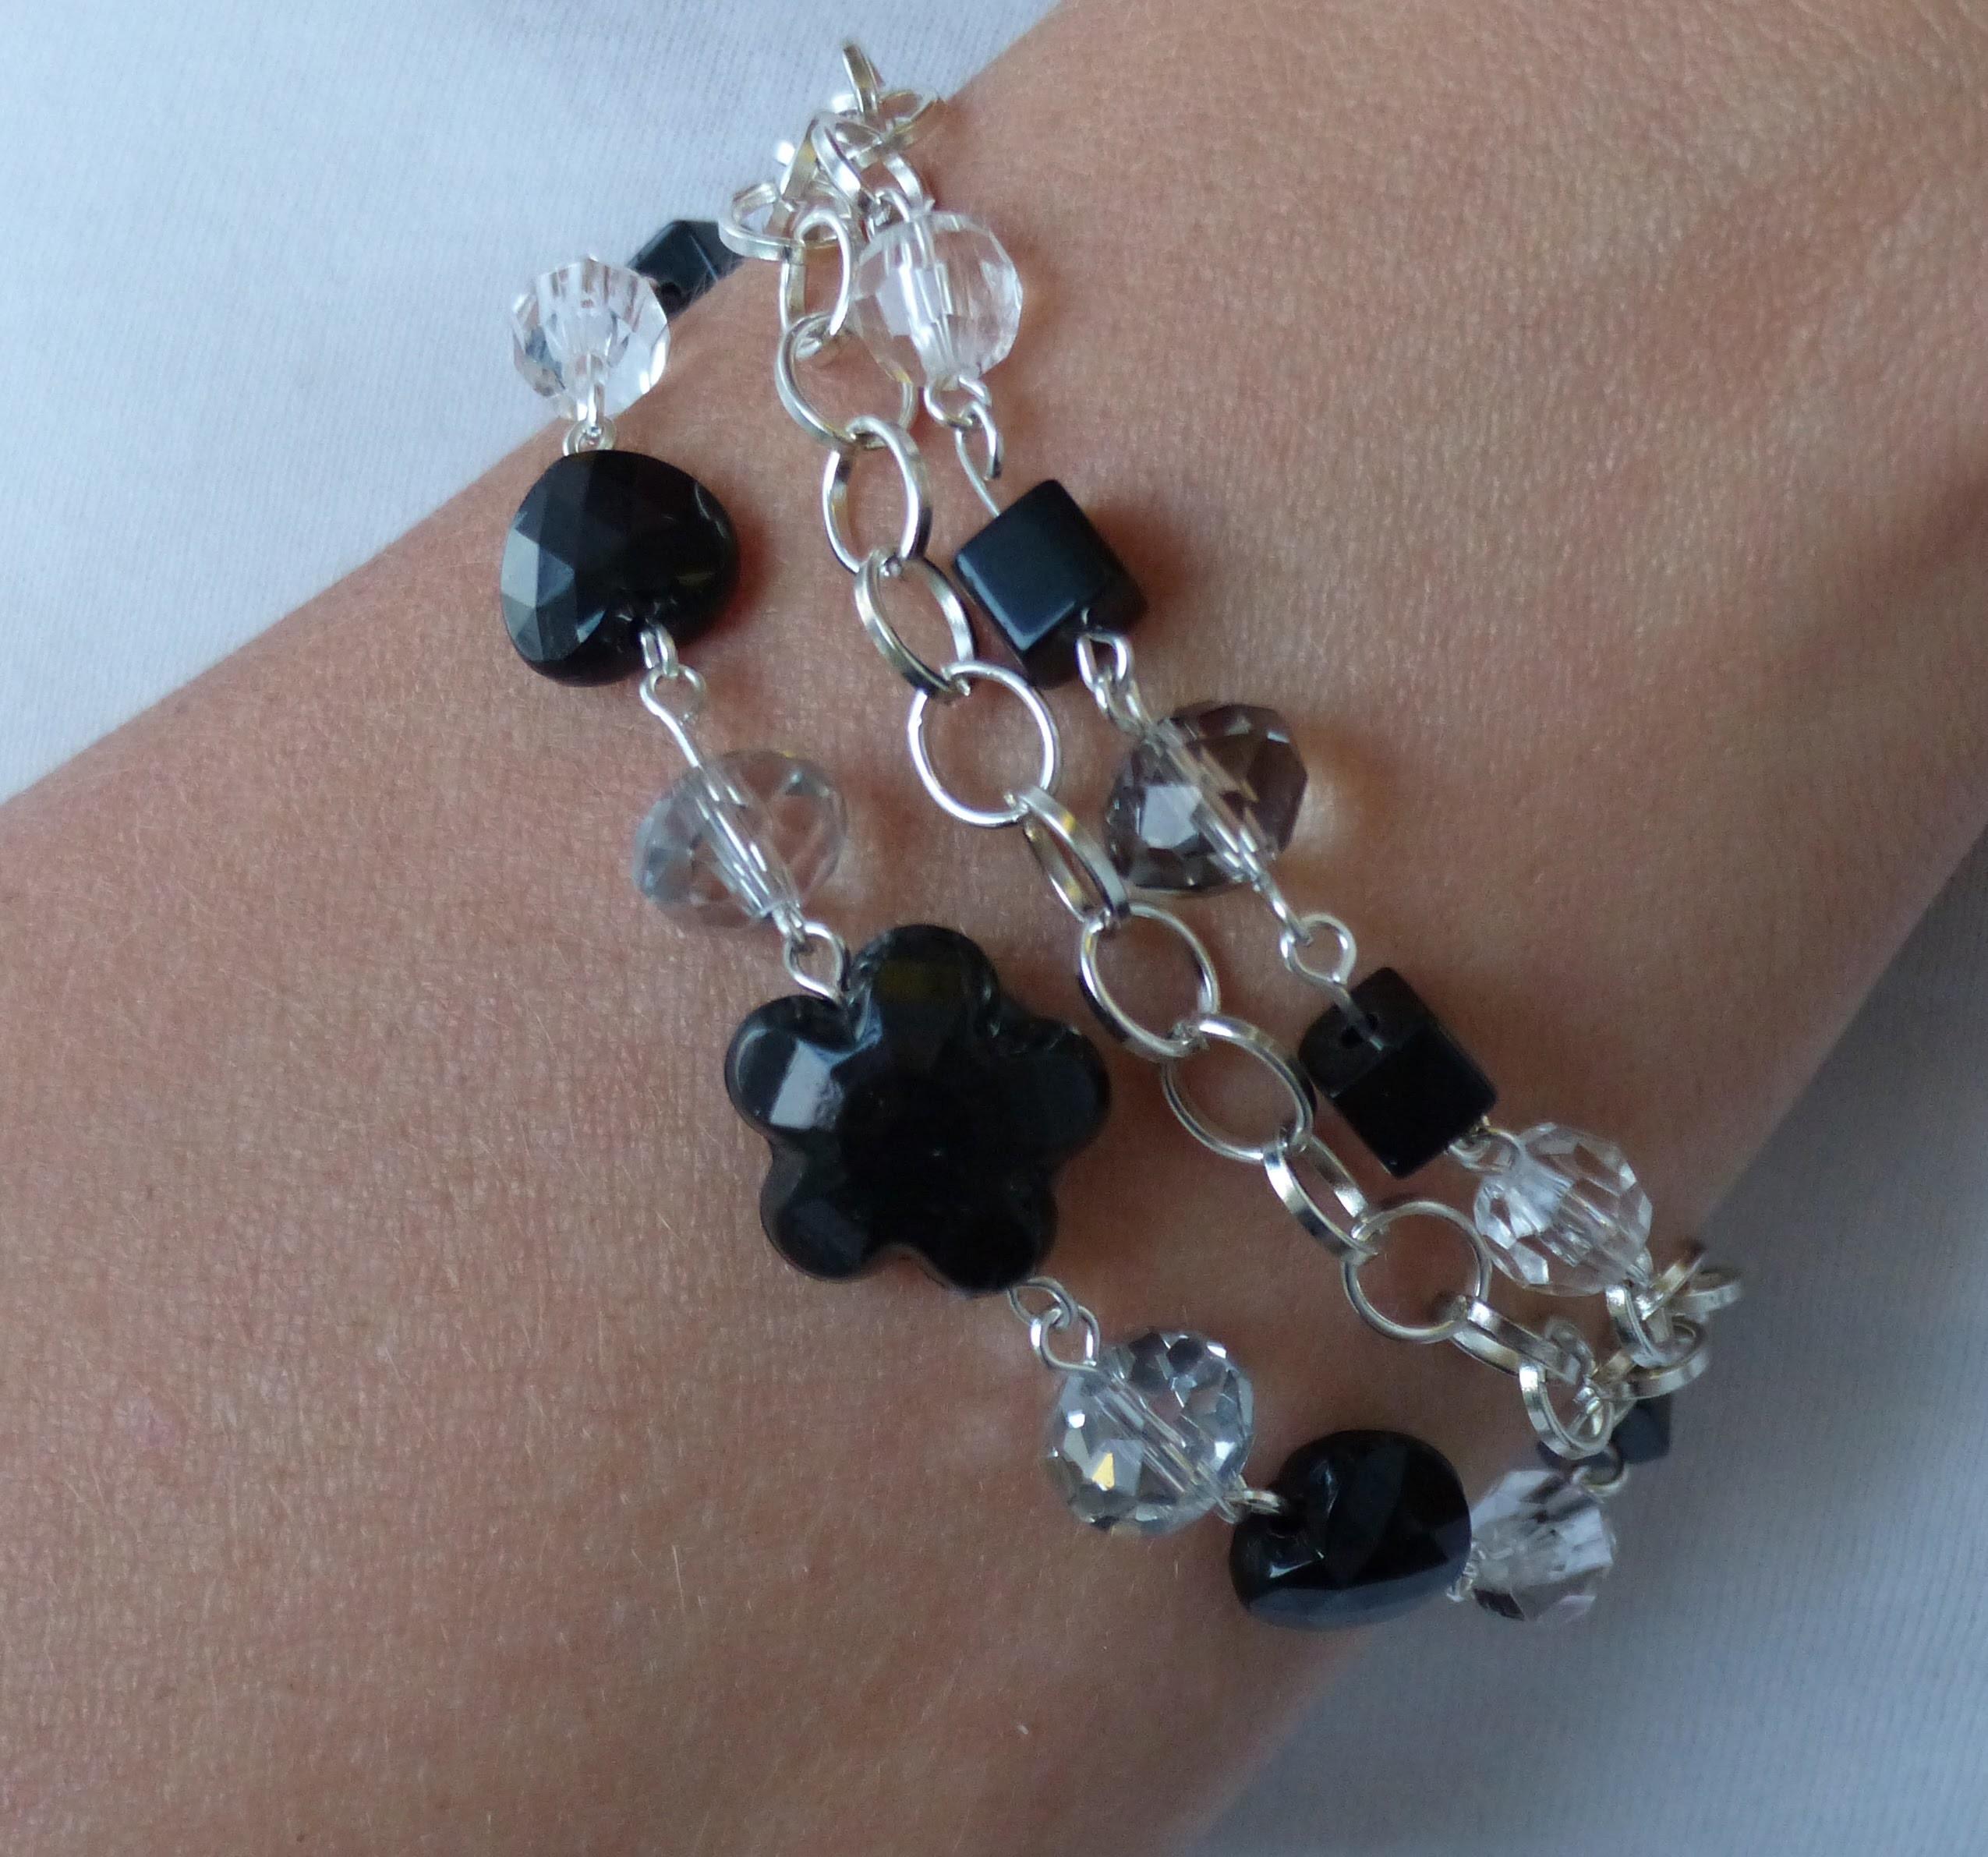 Bracelet beeds crystals DIY jewellery making Swarovski Bransoletka z koralików Браслет из бисера